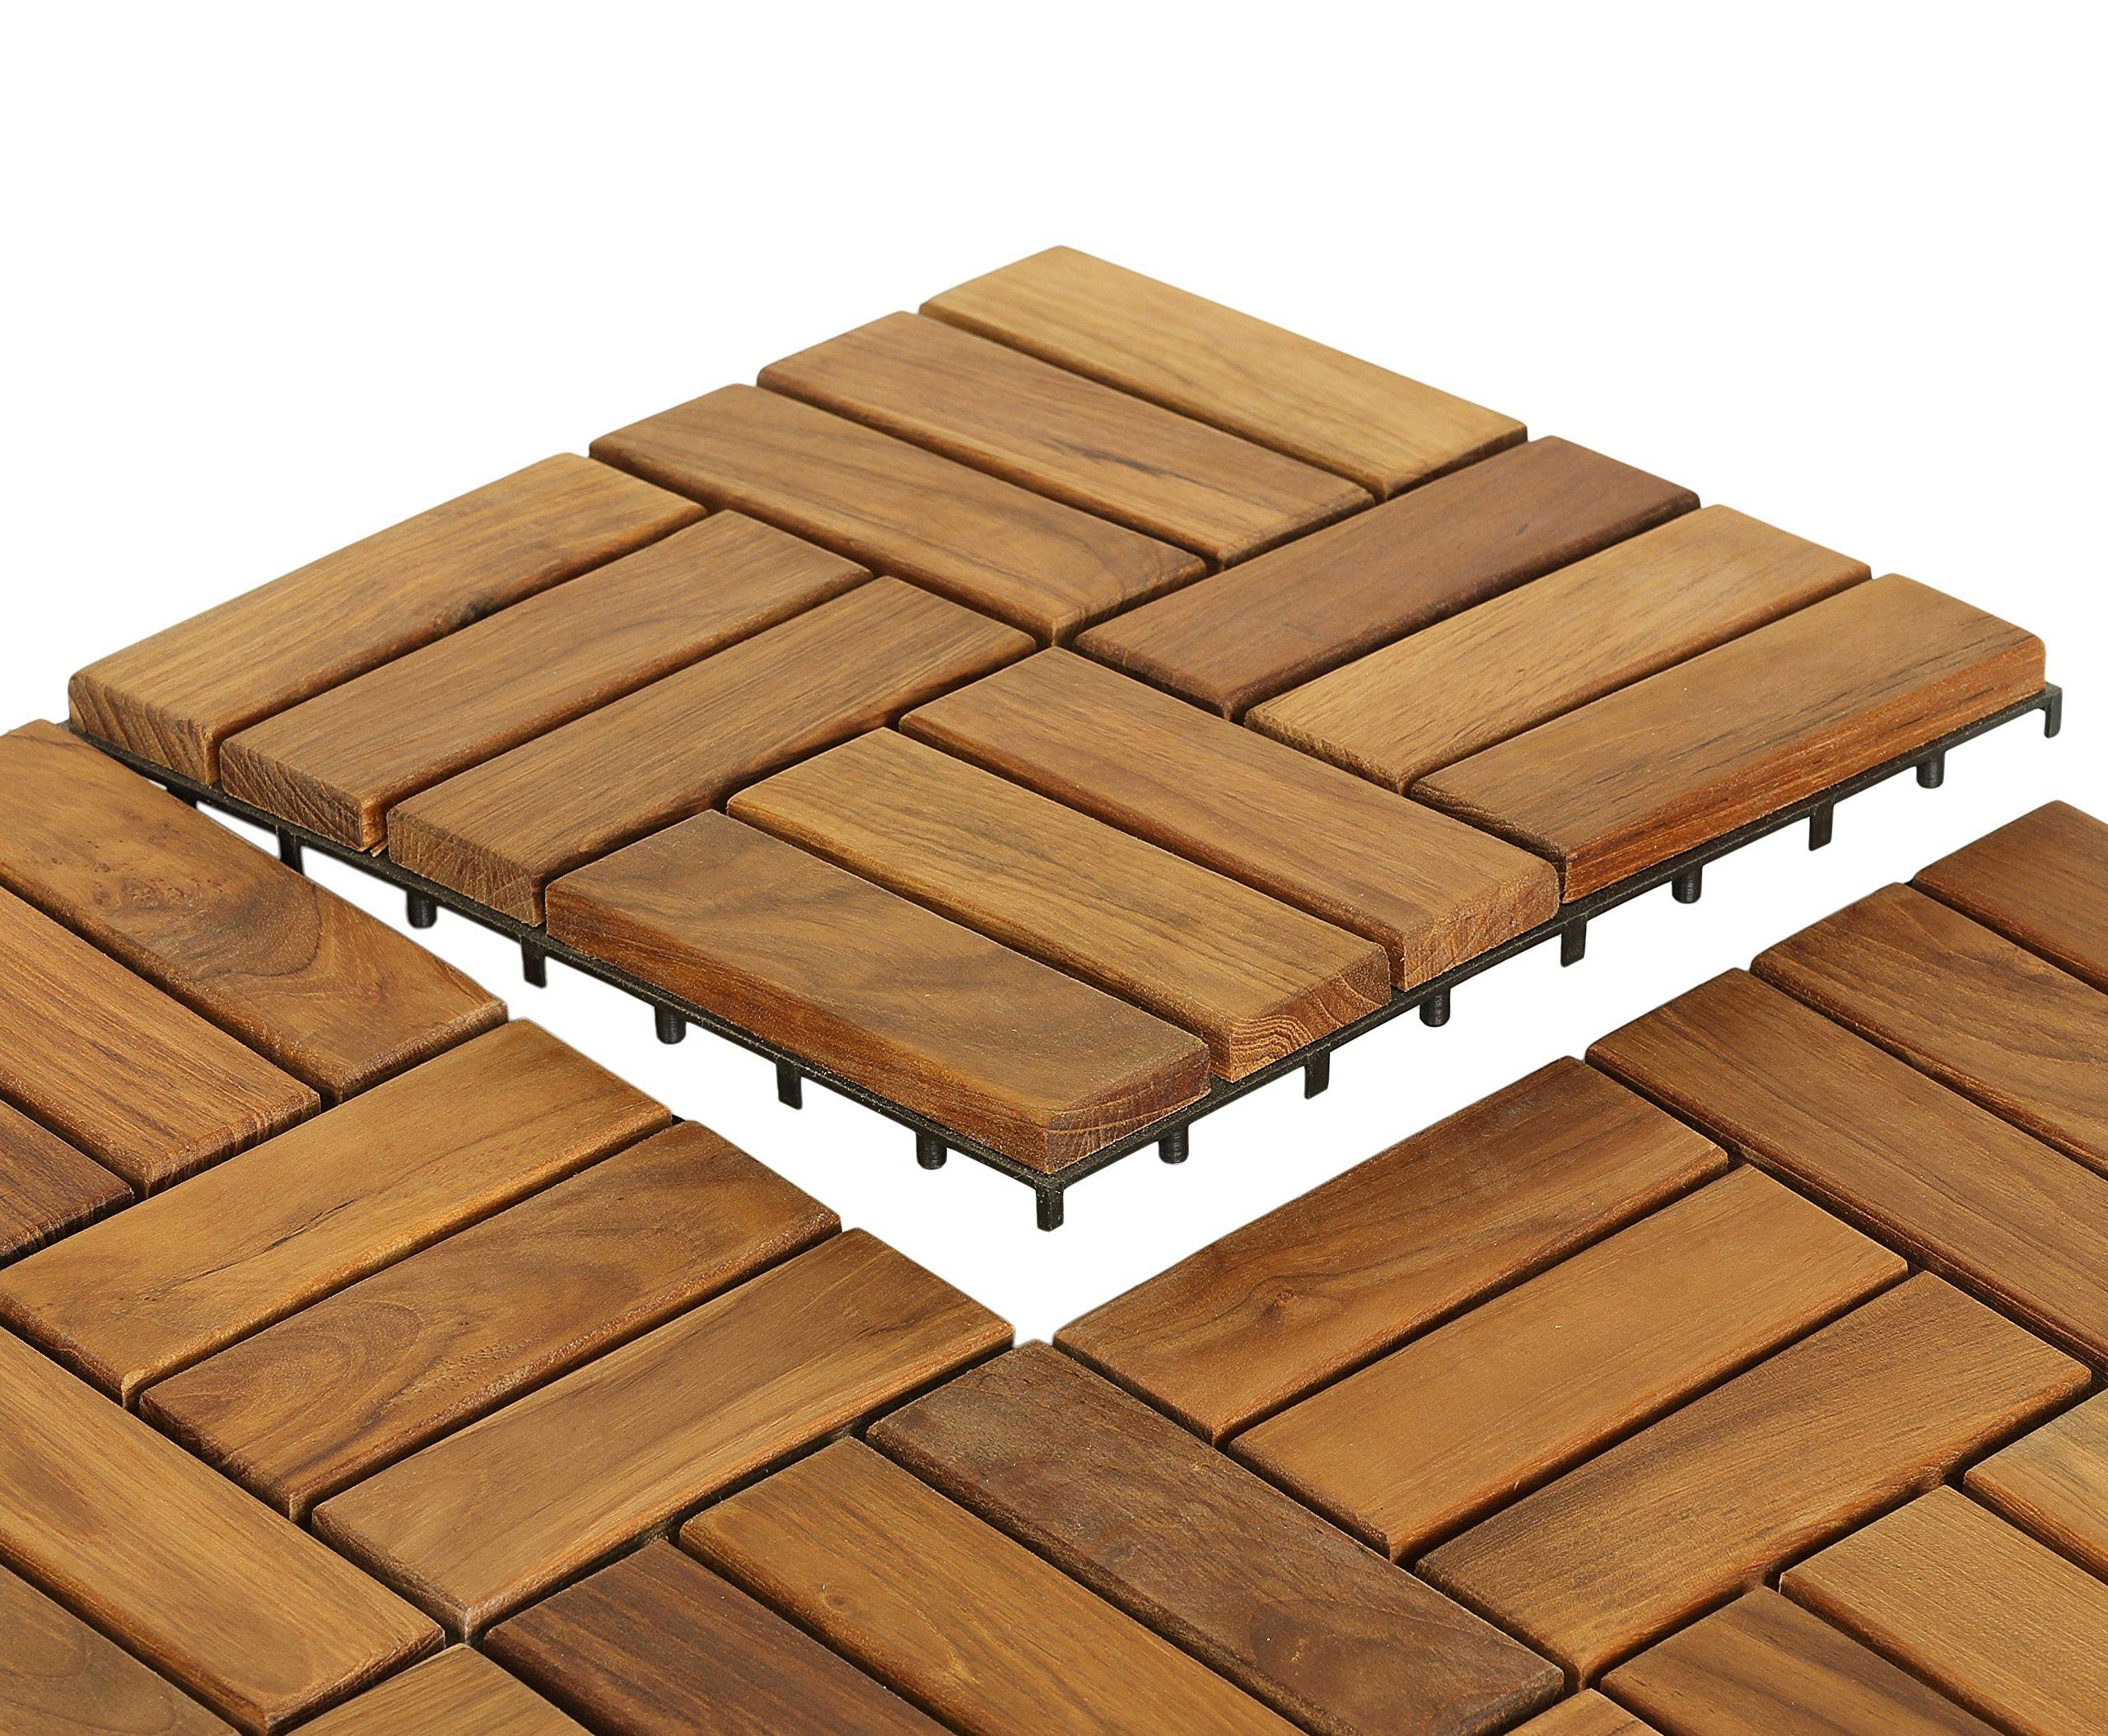 Bare Decor EZ-Floor in Solid Teak Wood, 1 TILE ONLY, Parquet